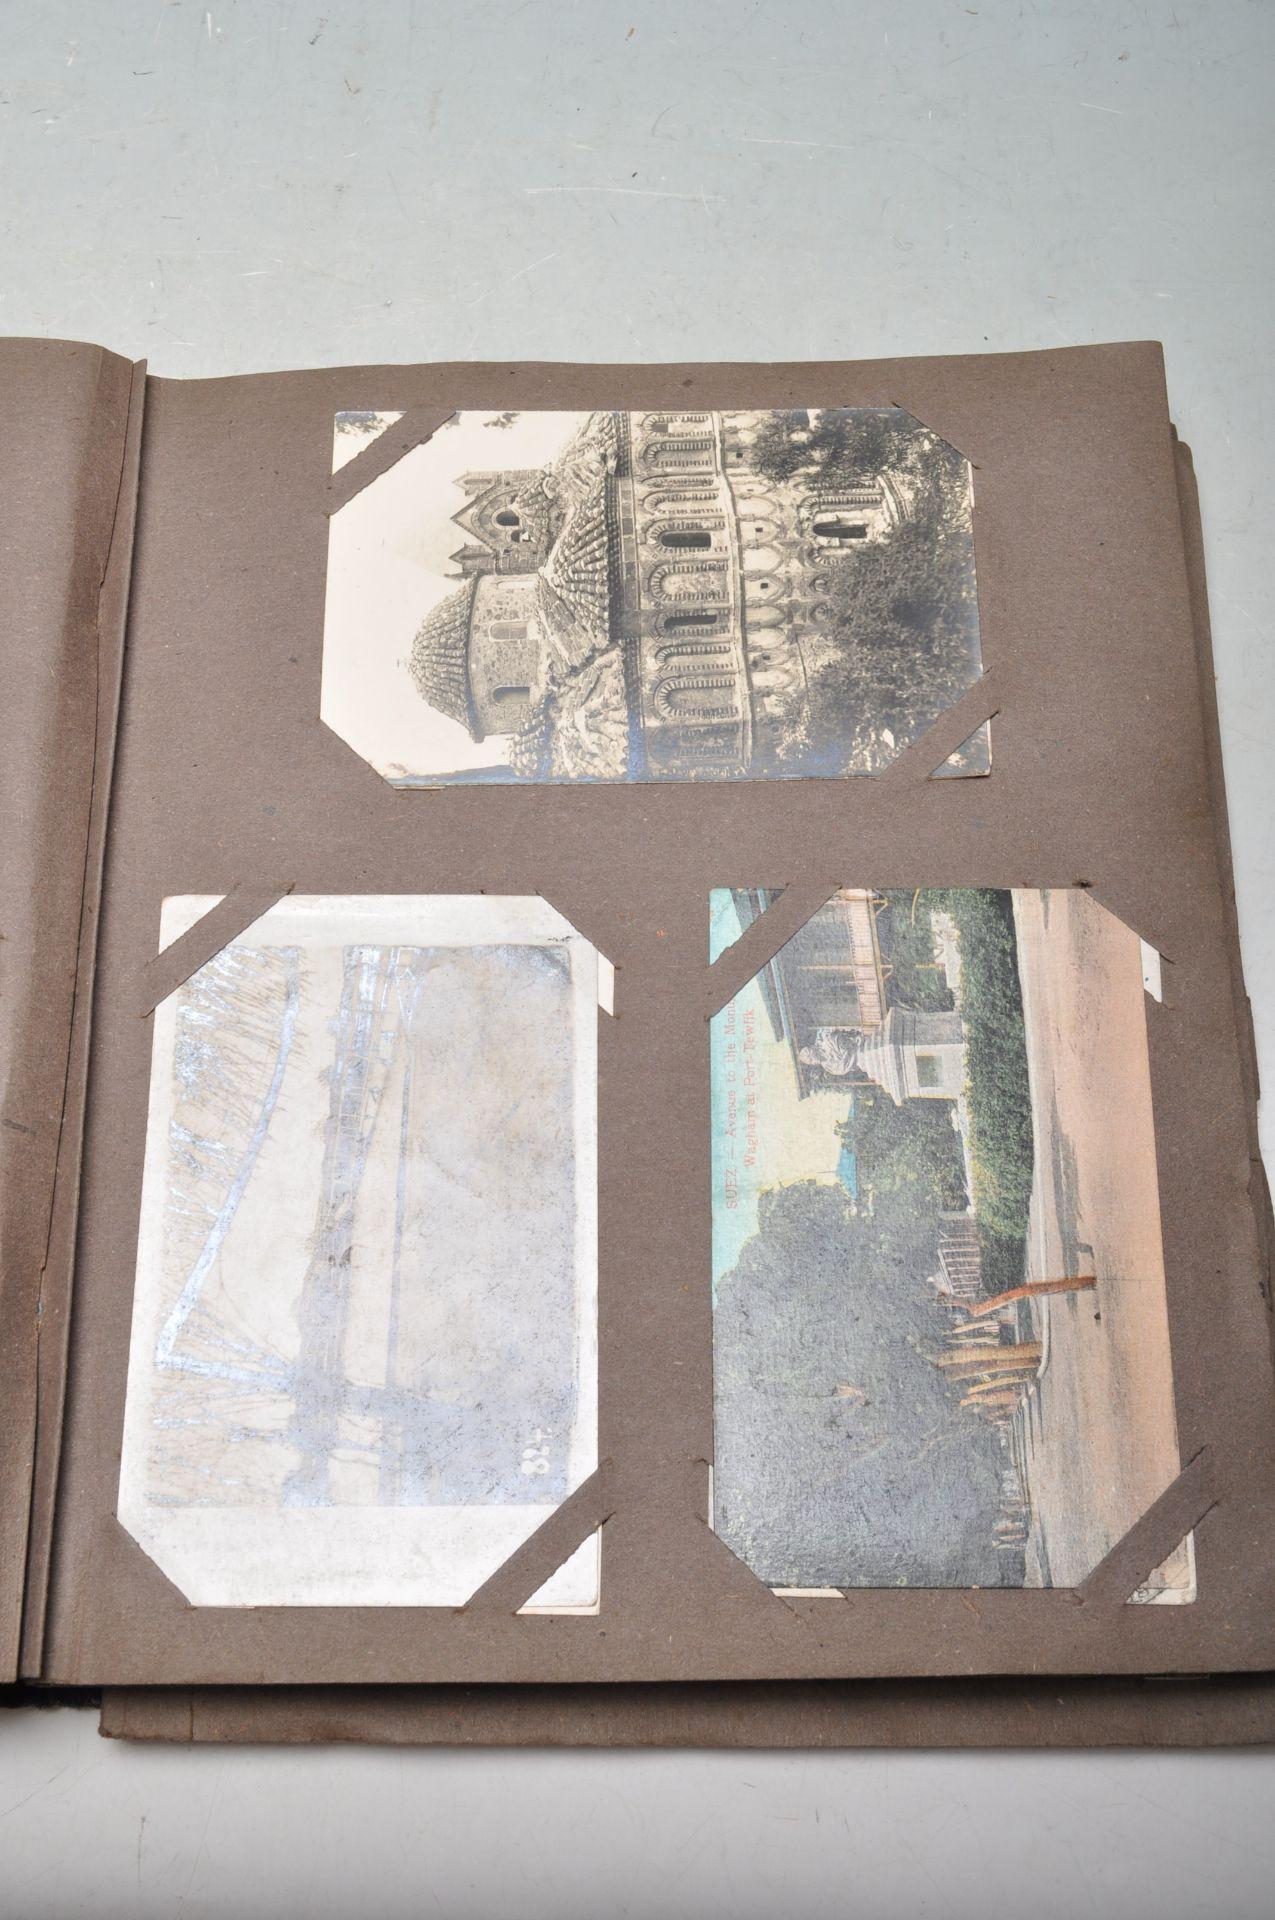 ALBUM OF FOREIGN POSTCARDS - ALL CIRCA WW1 PERIOD - Bild 11 aus 23